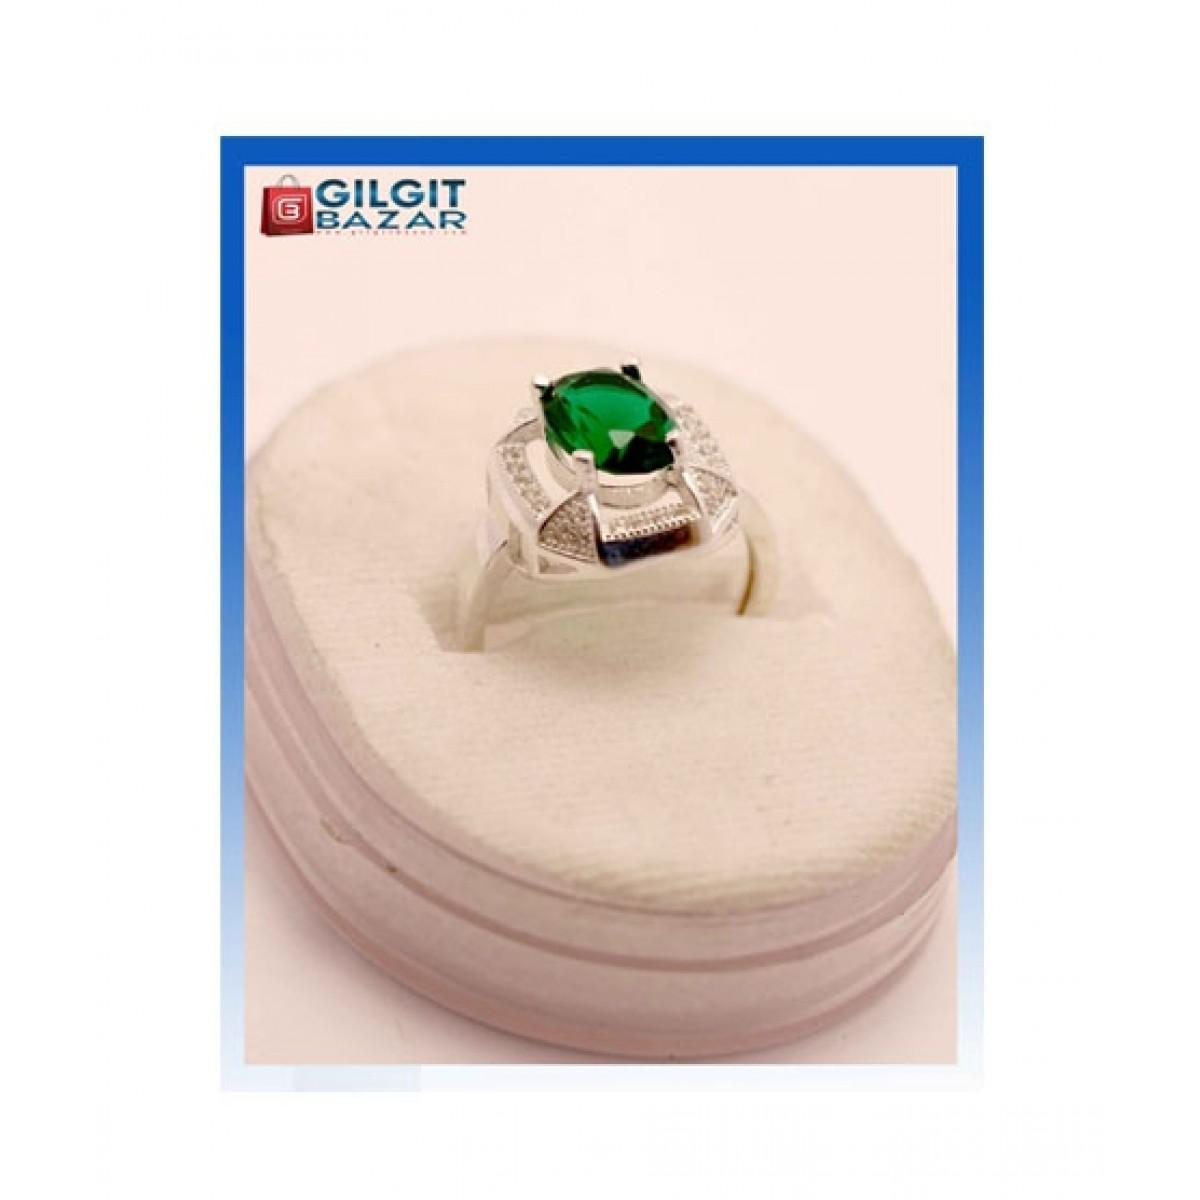 Gilgit Bazar Emerald Zamrud Ring For Women (GB1000)